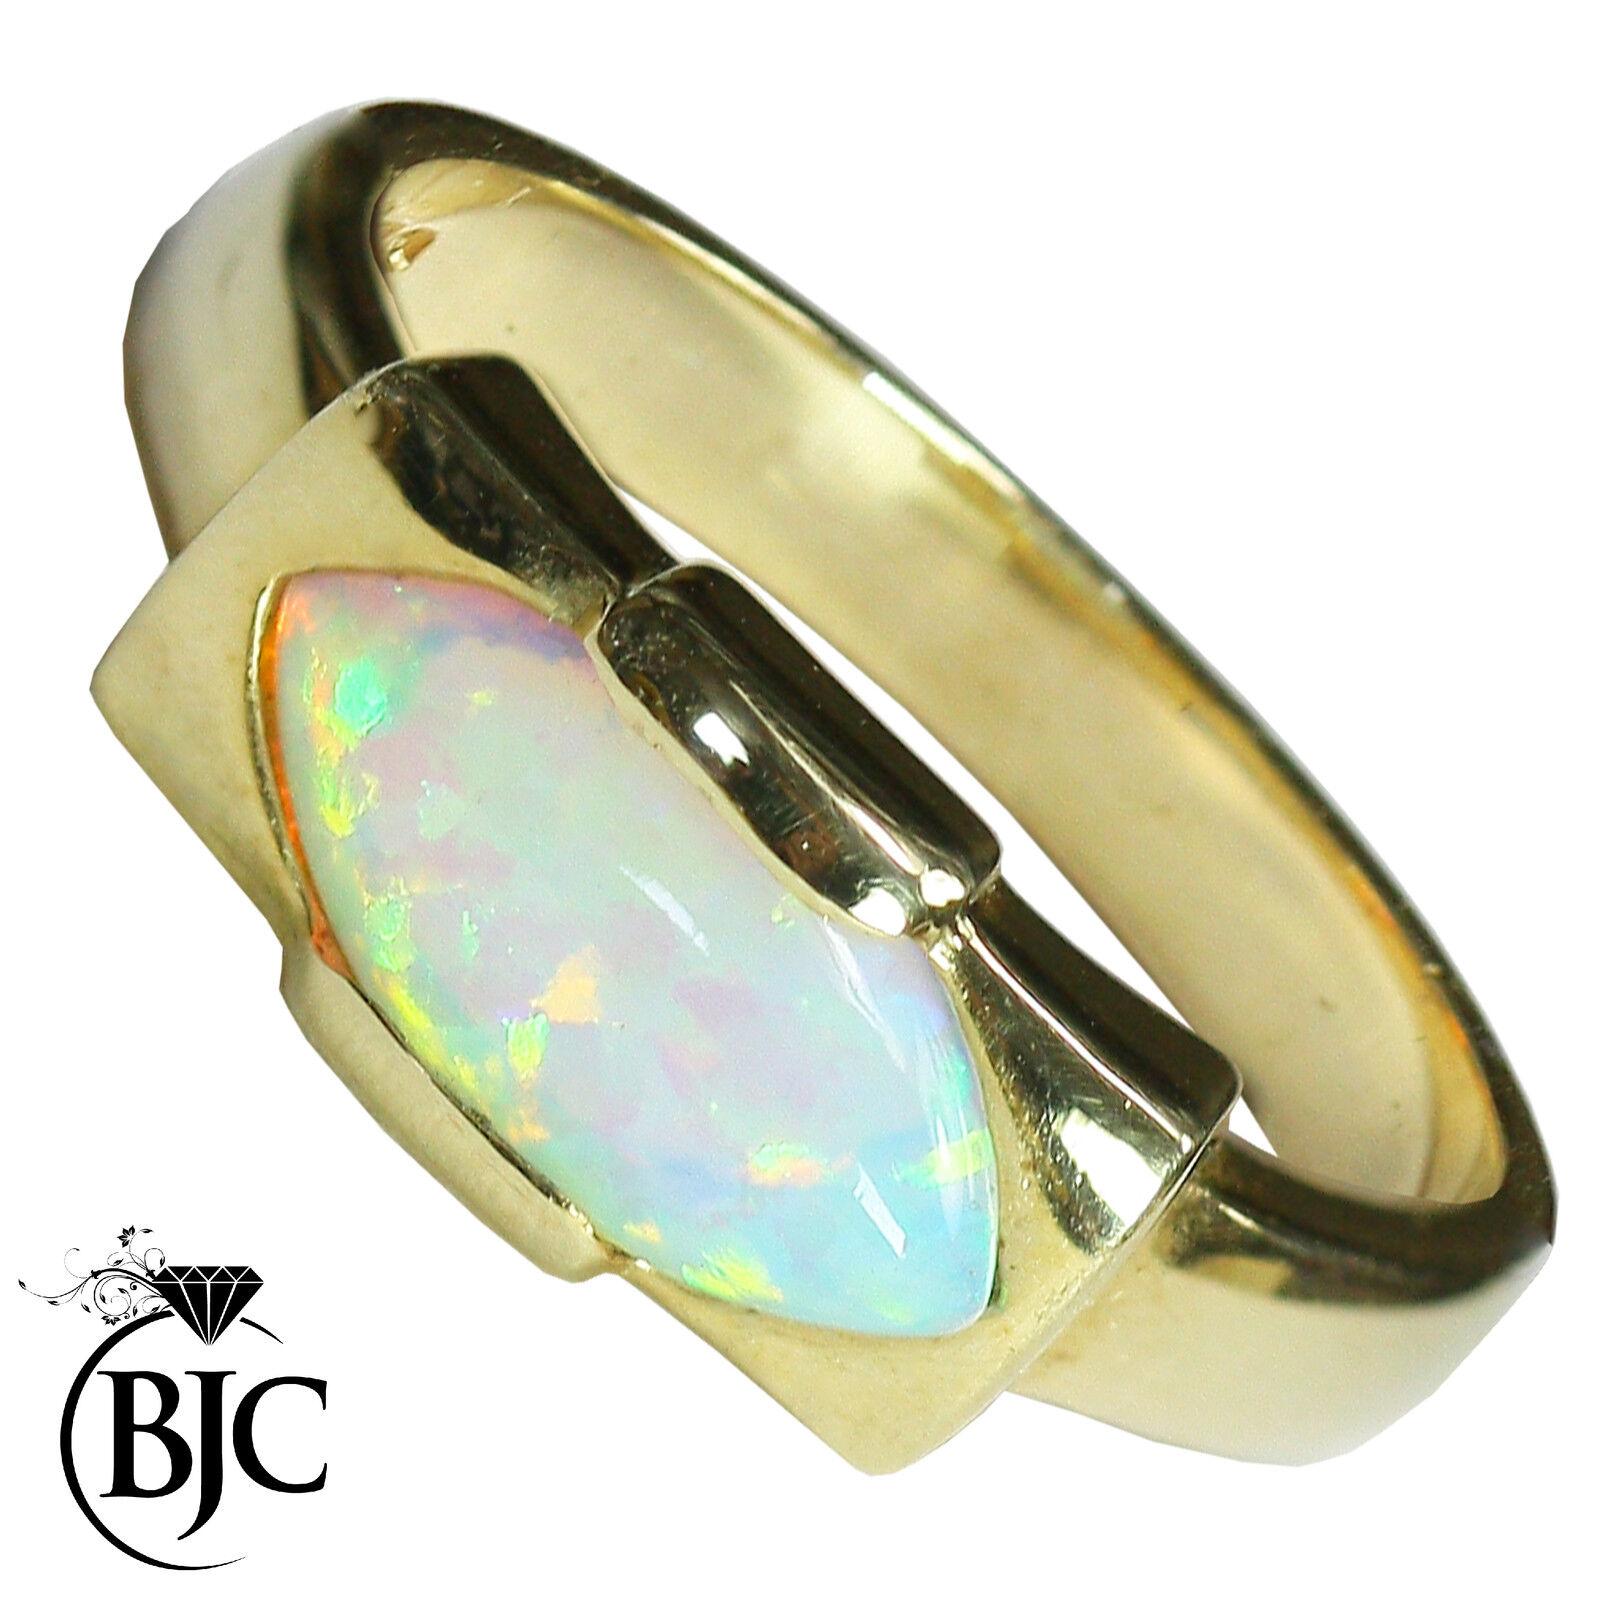 BJC 9 ct gold yellow Grande 2,00ct Ópalo Solitario size O vestido Marquesita